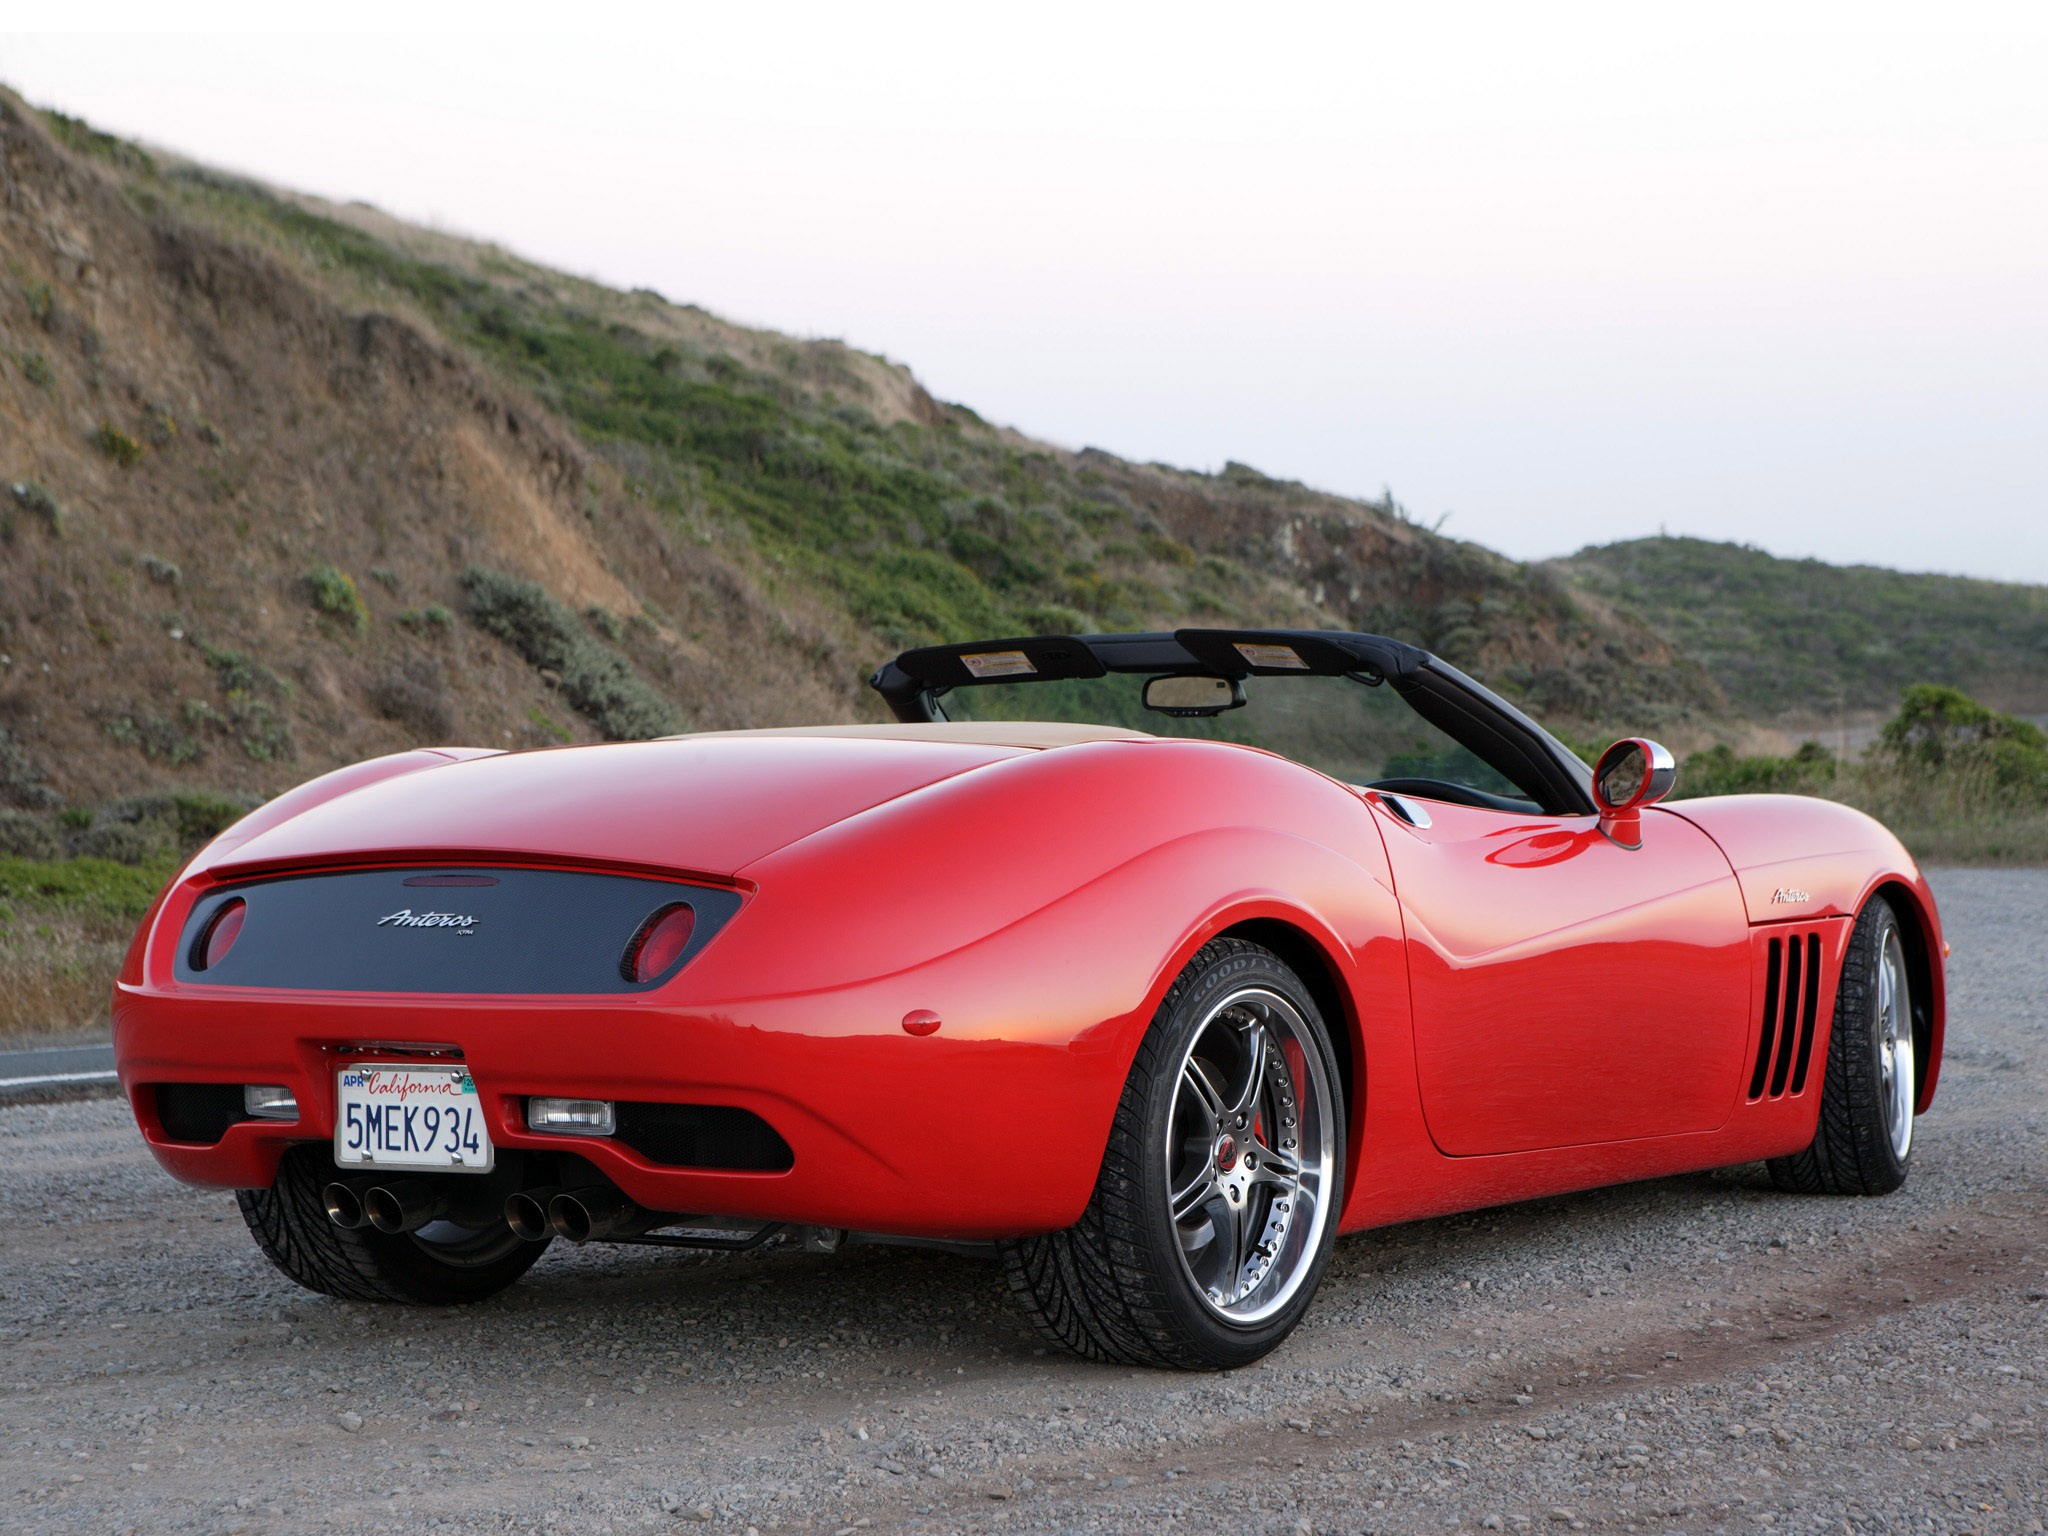 N2A Motors XTM Roadster (2007)